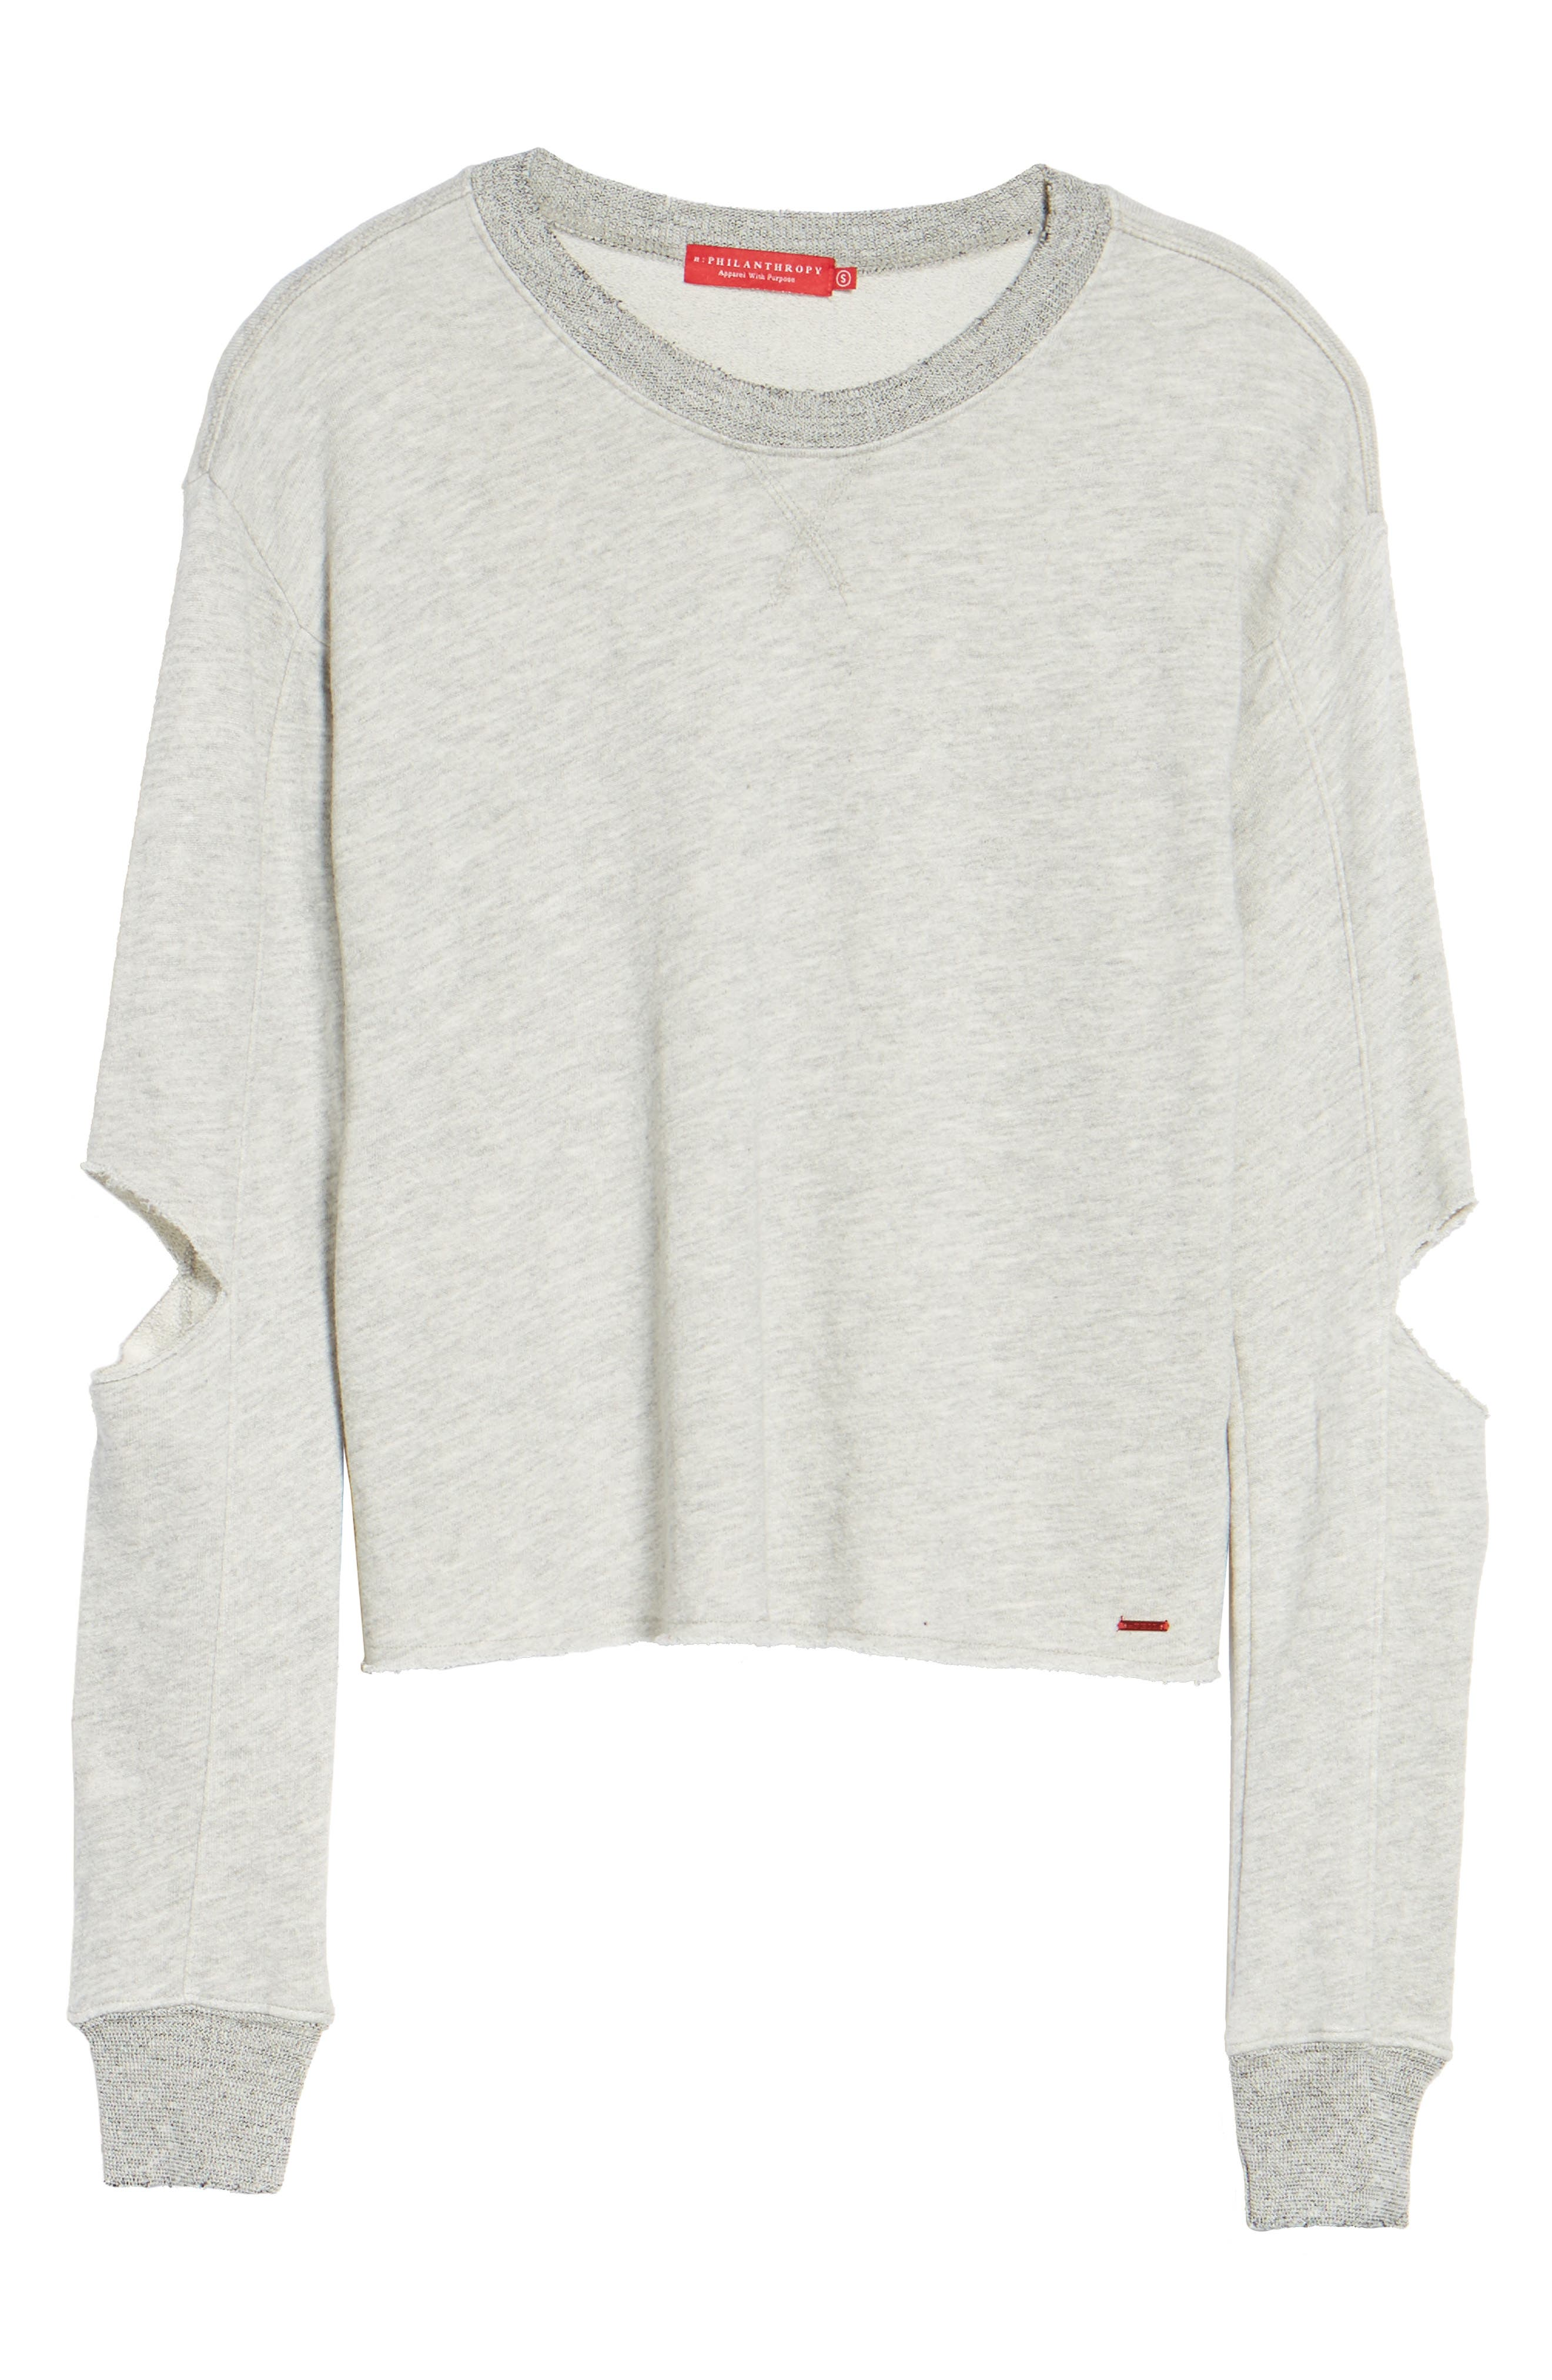 Savannah Cutout Sweatshirt,                             Alternate thumbnail 6, color,                             030